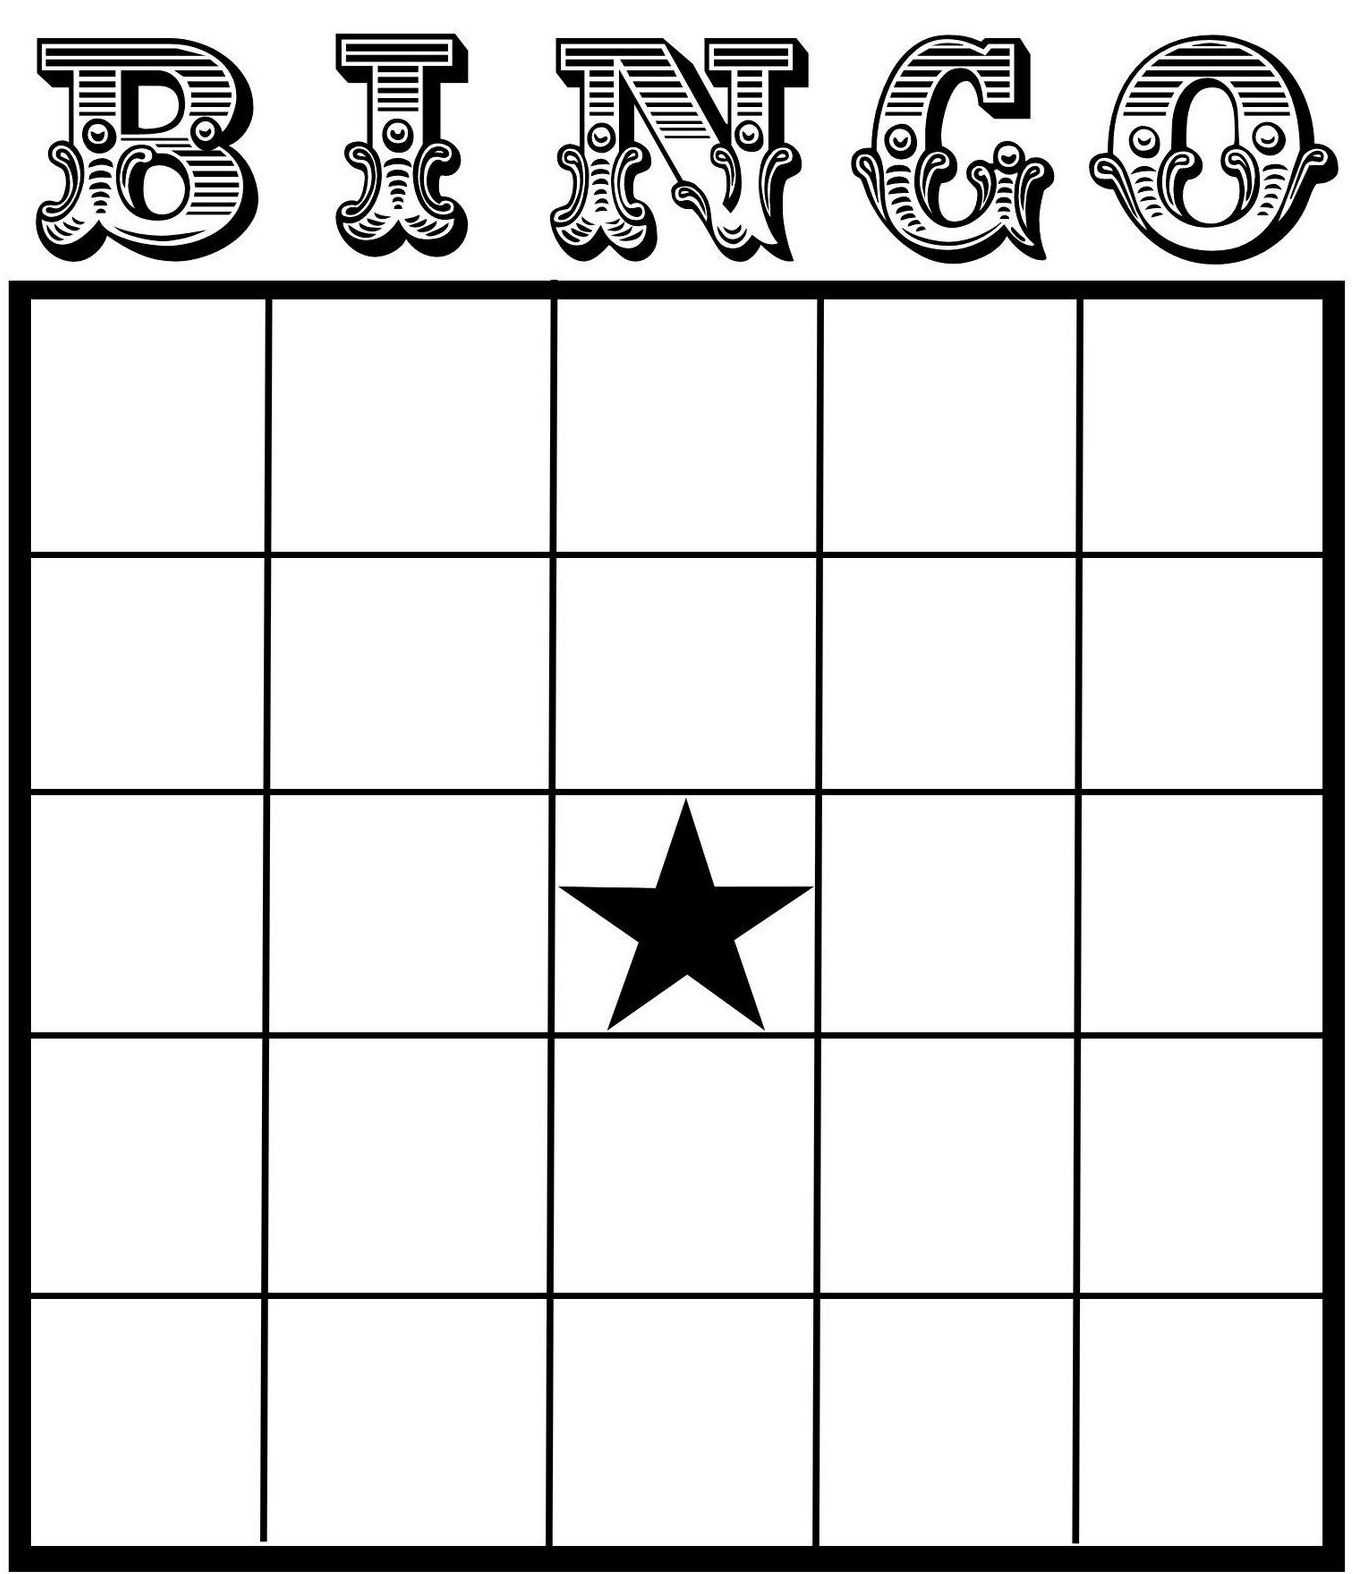 Free Printable Bingo Card Template - Set Your Plan & Tasks With Regard To Blank Bingo Card Template Microsoft Word